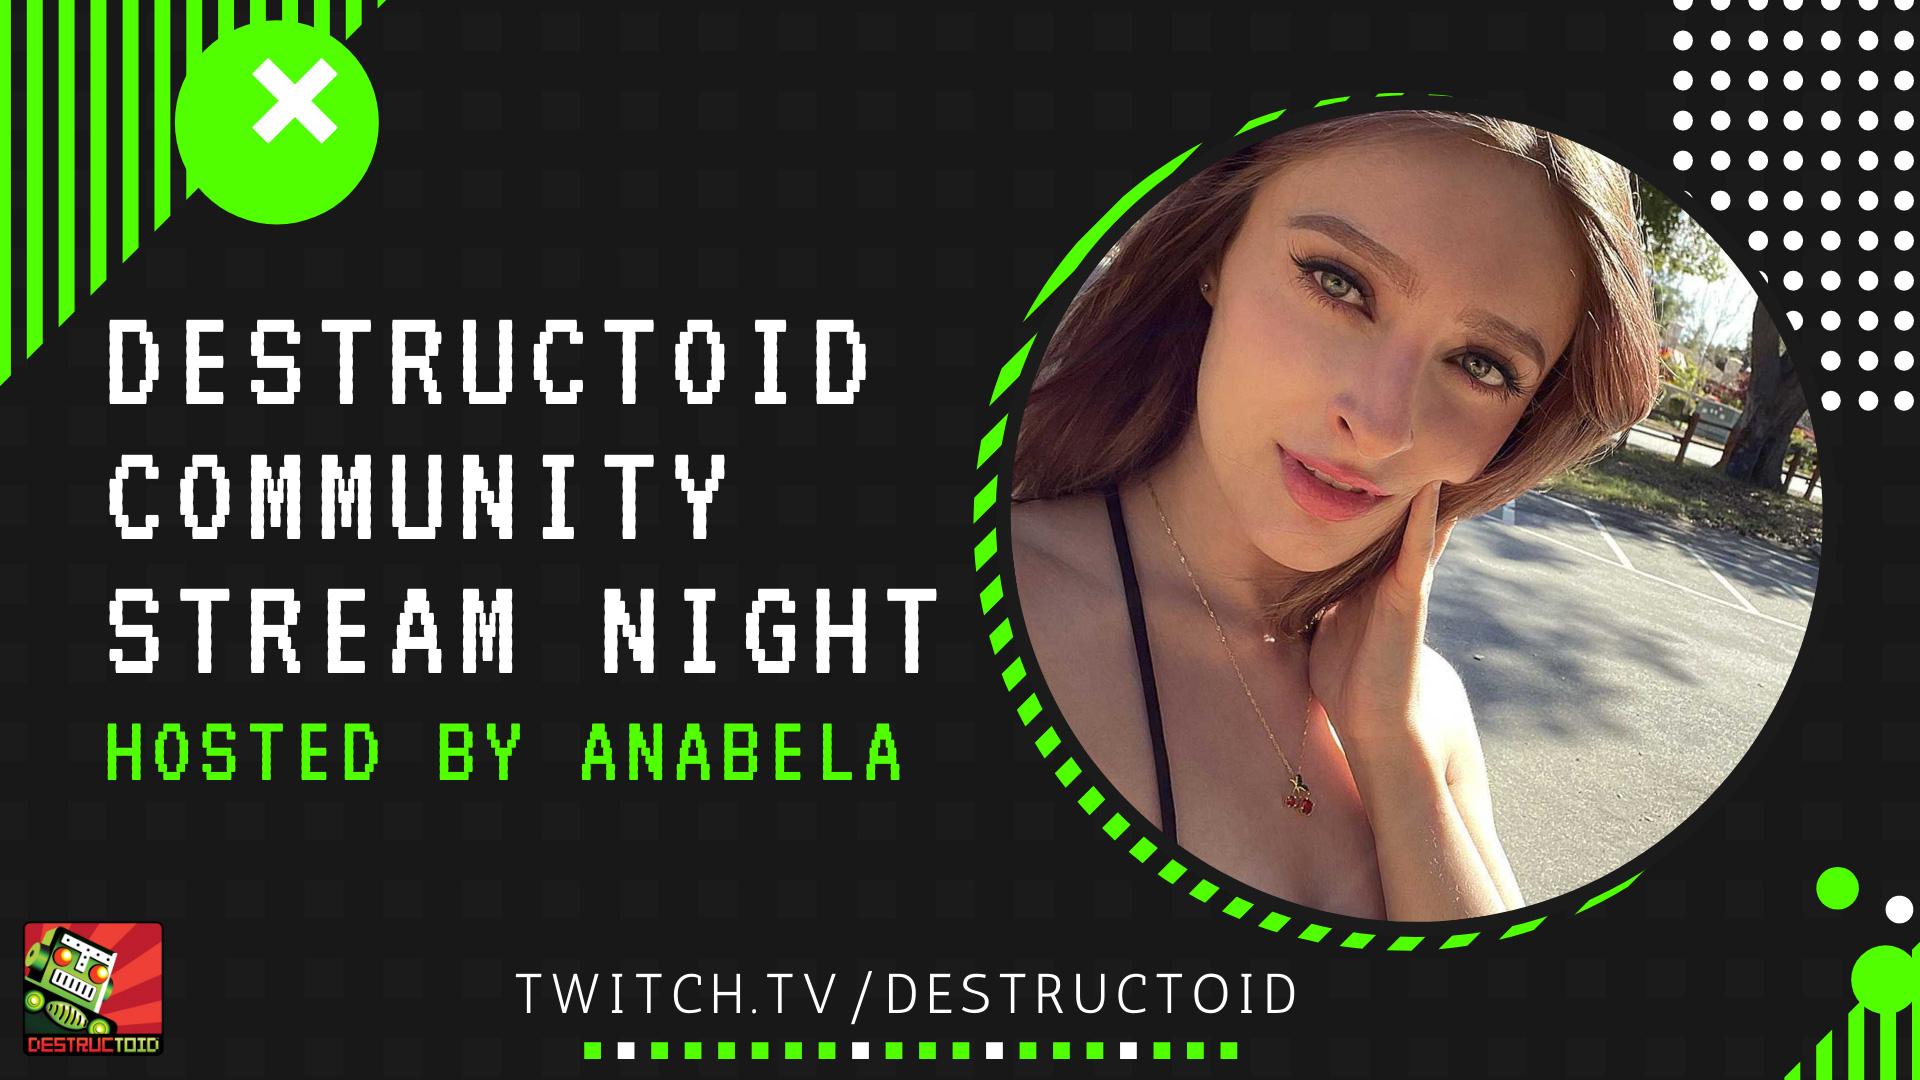 Destructoid community stream night is live on Twitch